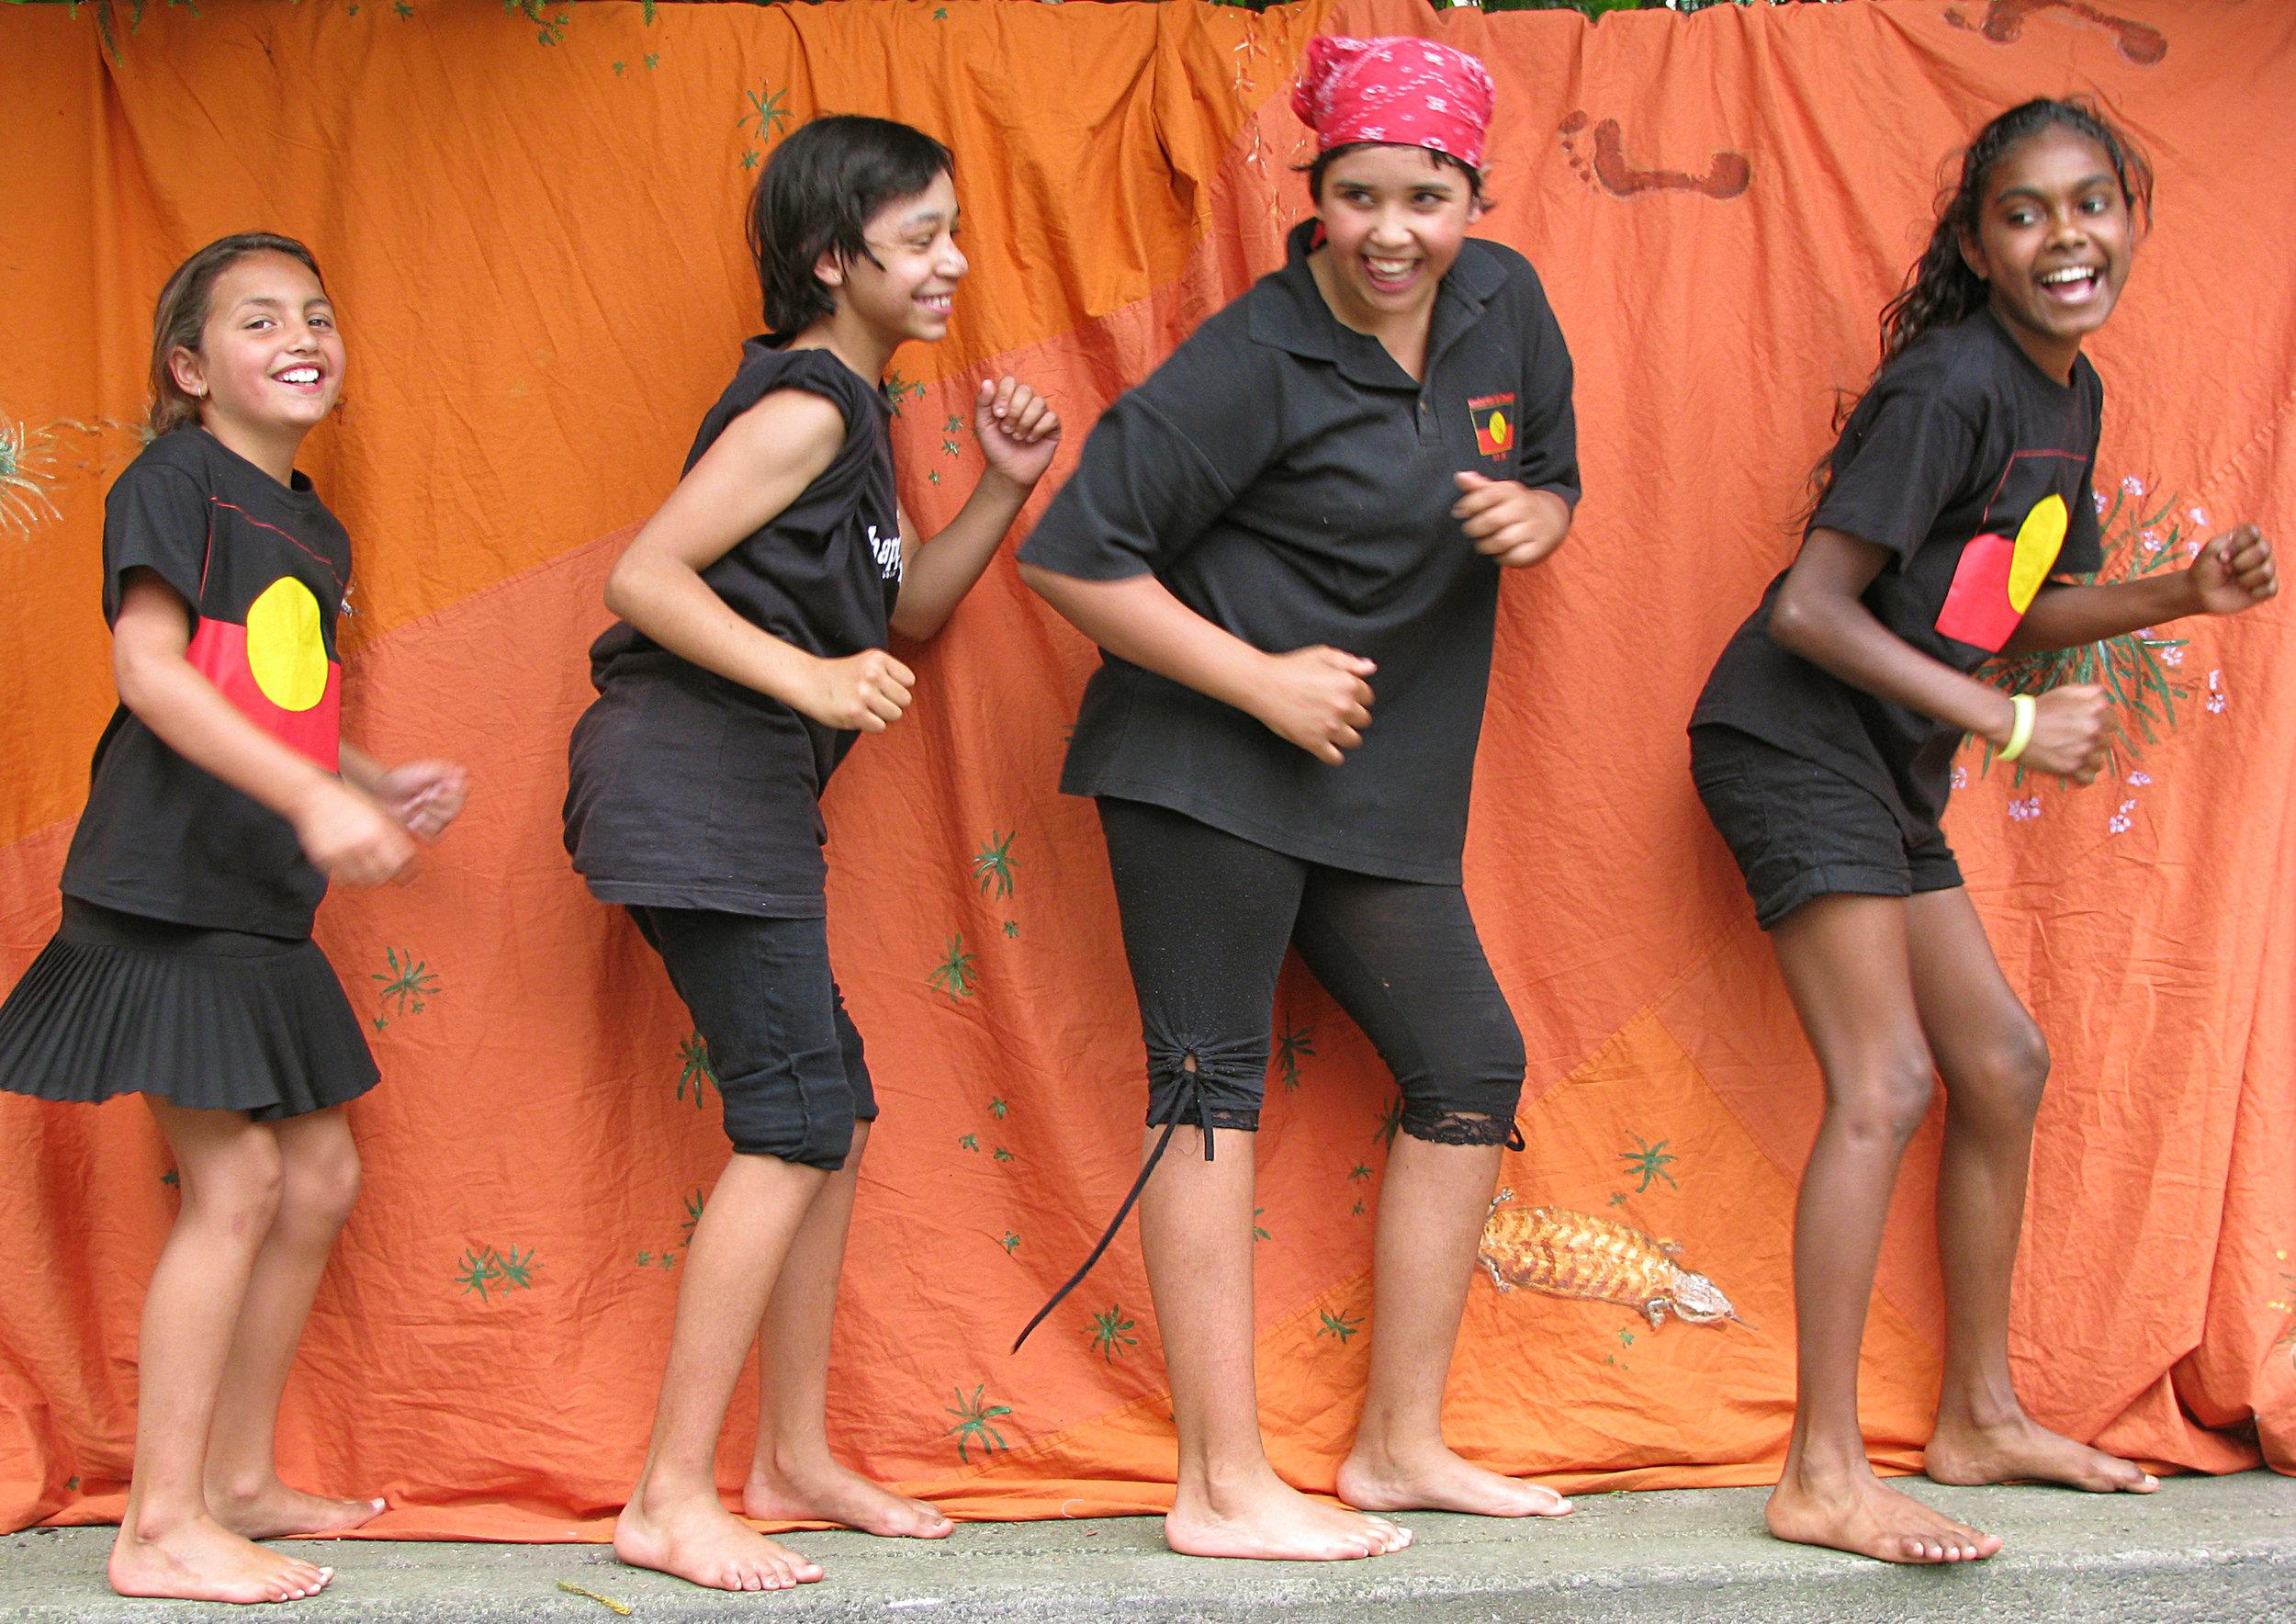 Aboriginal girls singing with lAboriginal anguage words from Wiradjuri language dancing wearing Aboriginal flag T Shirts, red, black and yellow